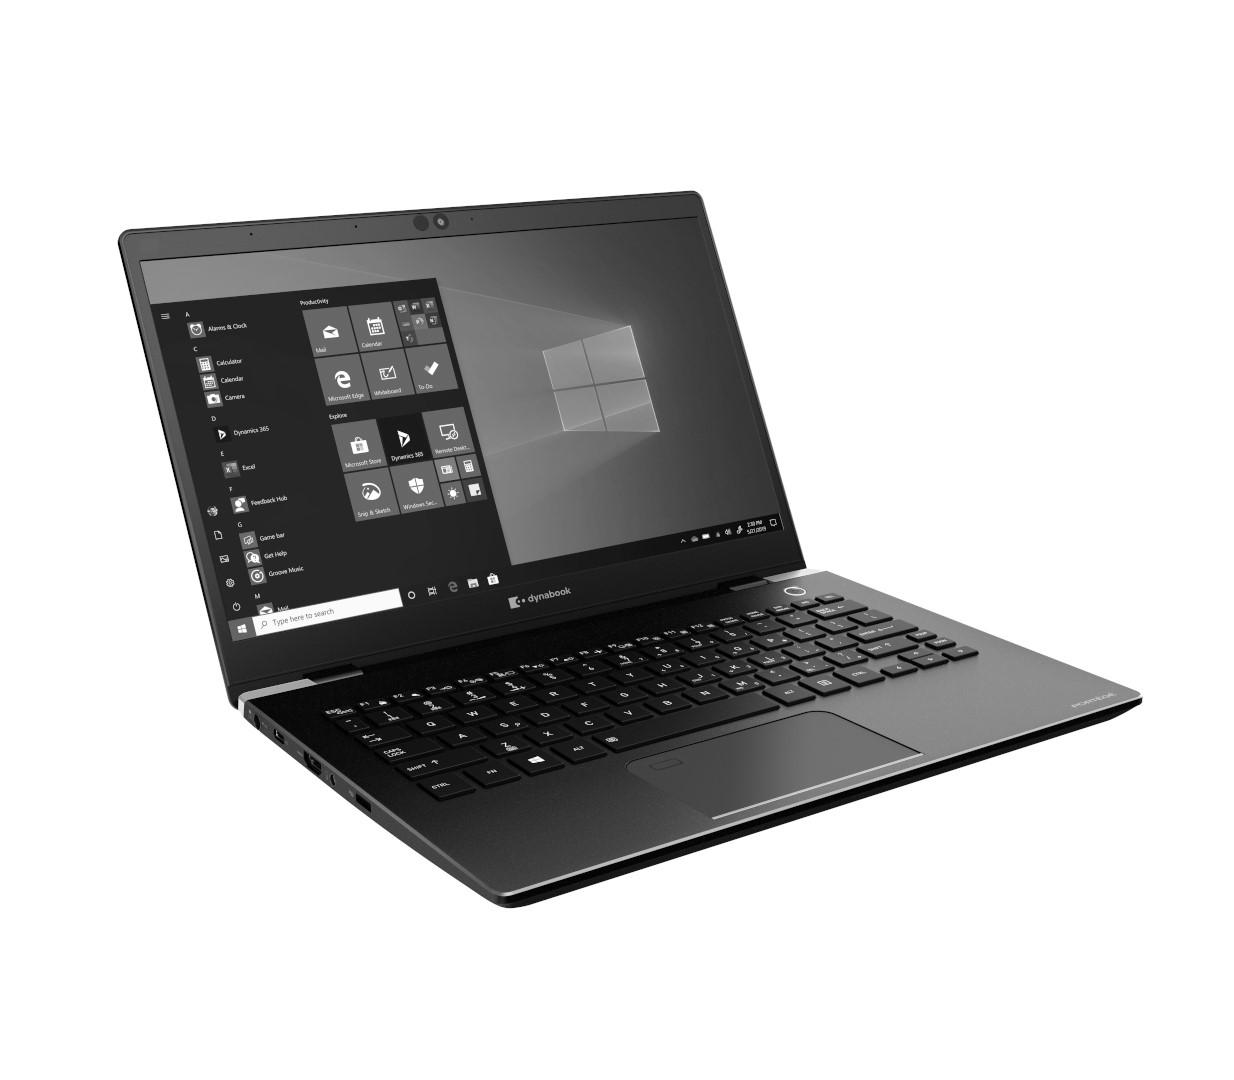 dynabook-portégé-x30l-kaufen-in-köln